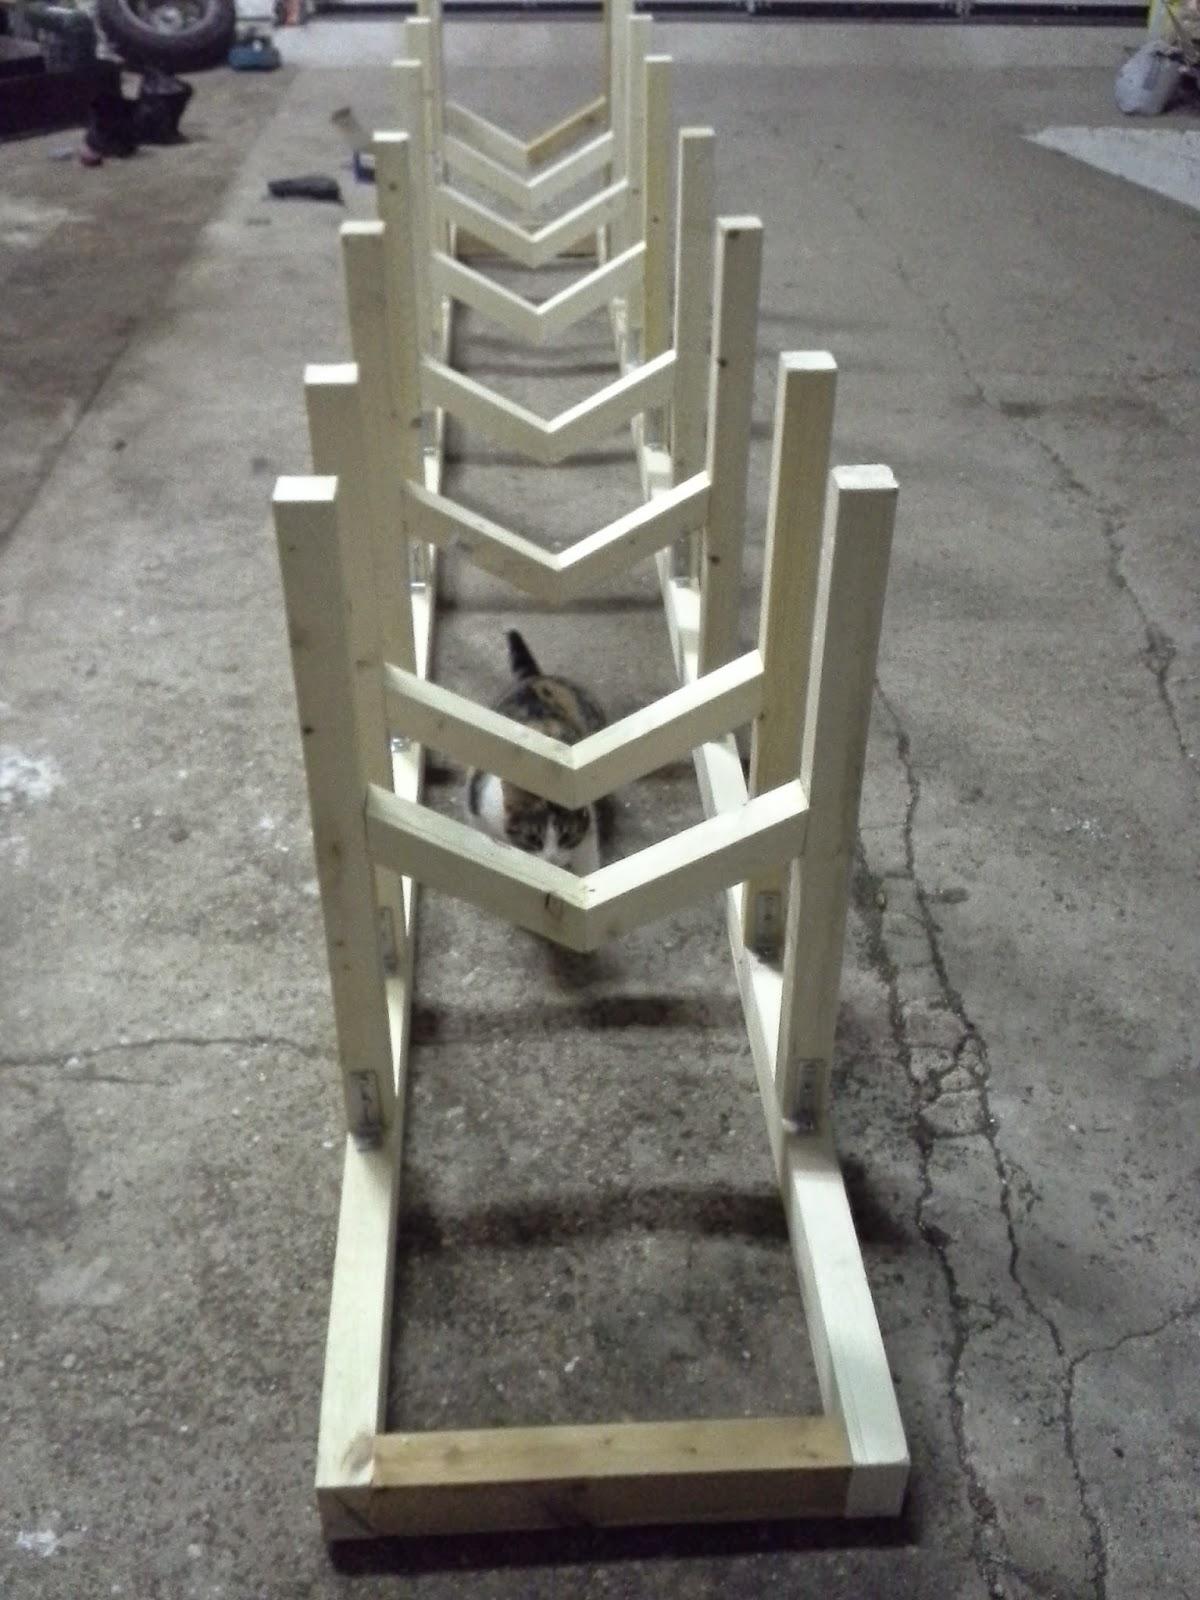 heizen mit holz kleinholz brennholz schneiden. Black Bedroom Furniture Sets. Home Design Ideas